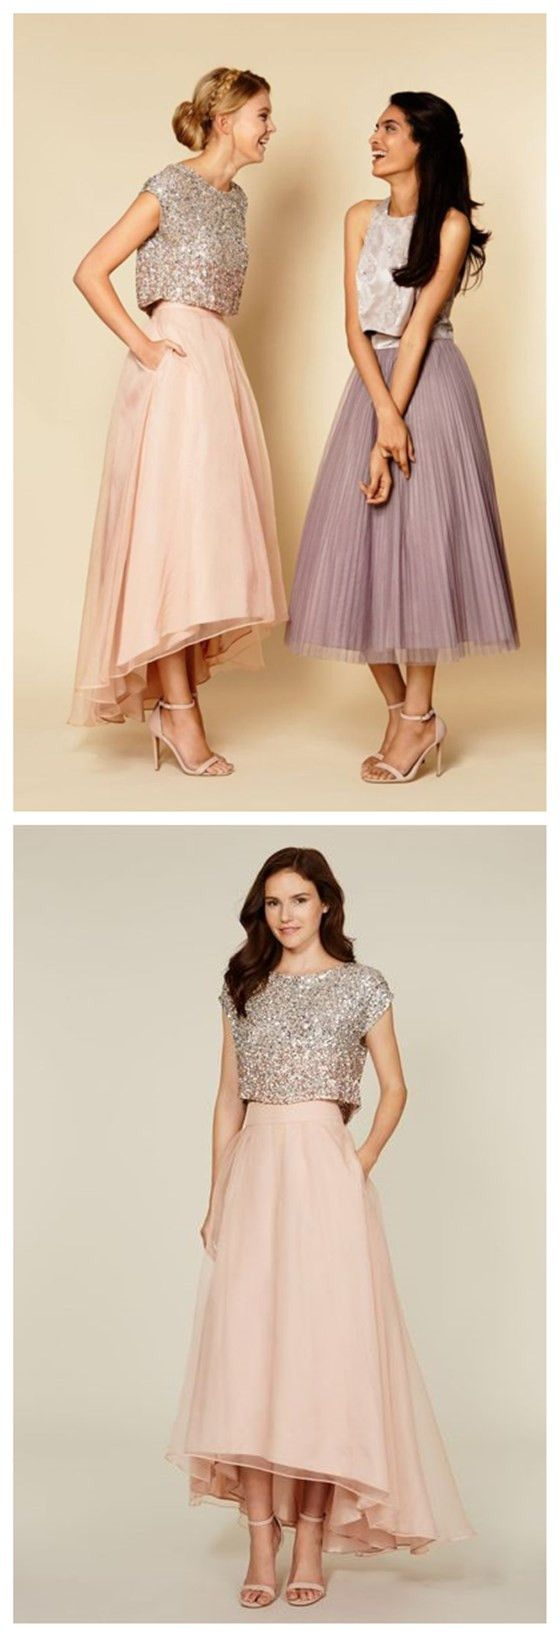 Bridesmaid Prom Dresses,Tea Length Prom Dresses, Party Prom Dresses, Vintage…